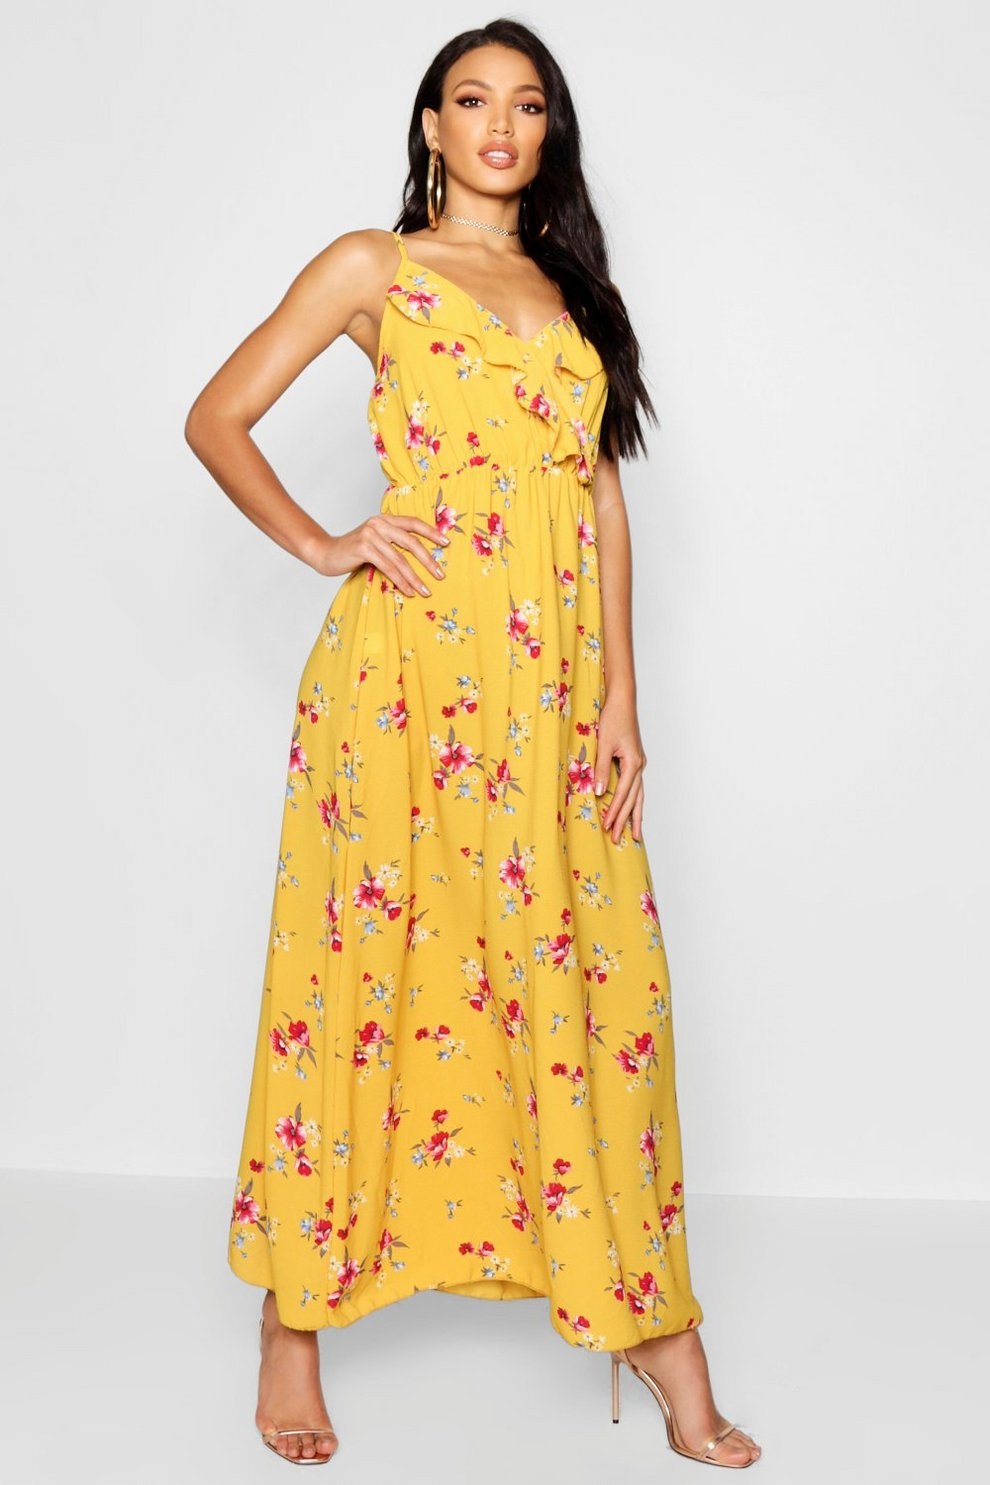 5cff7d12635 Floral Print Ruffle Maxi Dress